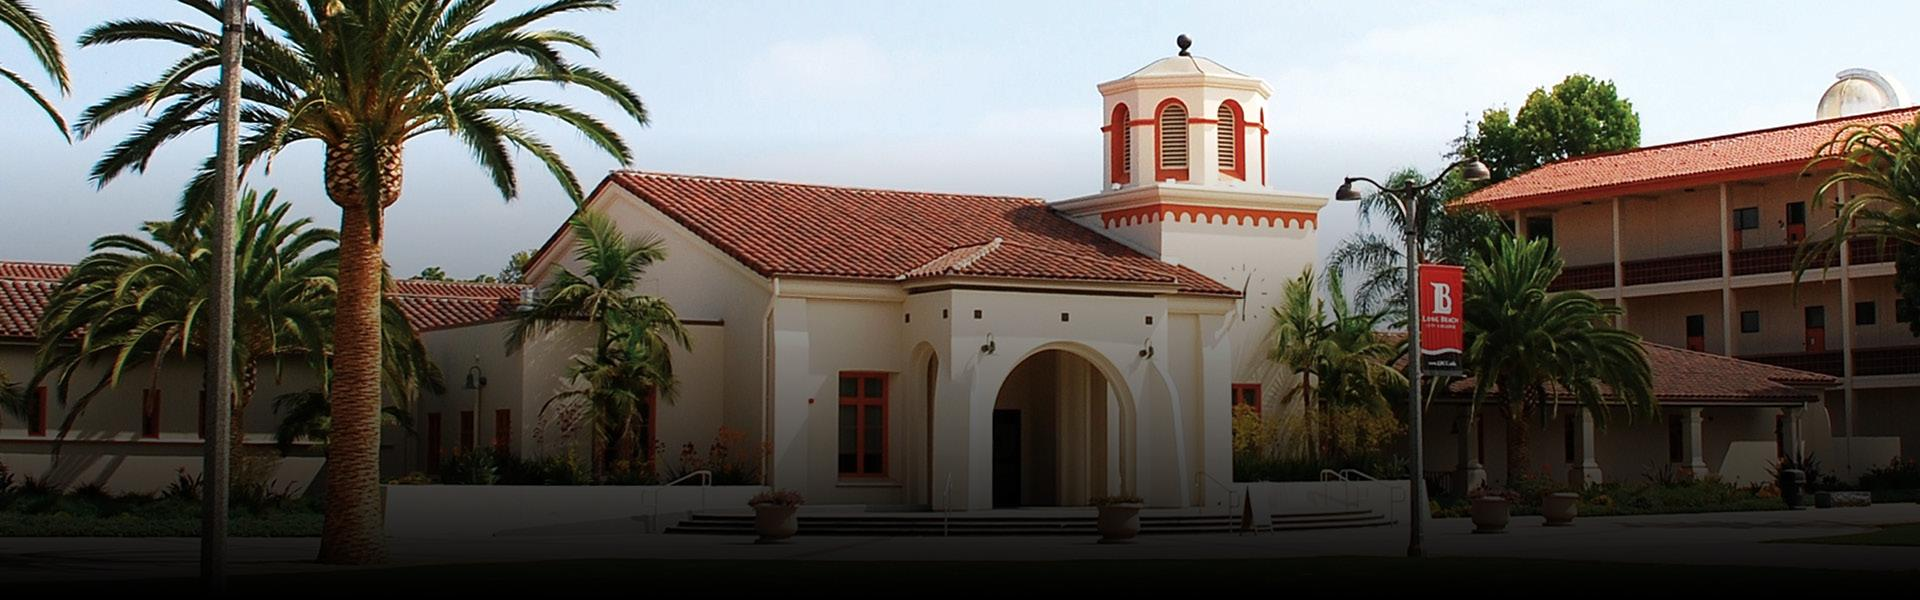 Long Beach City College Lbcc